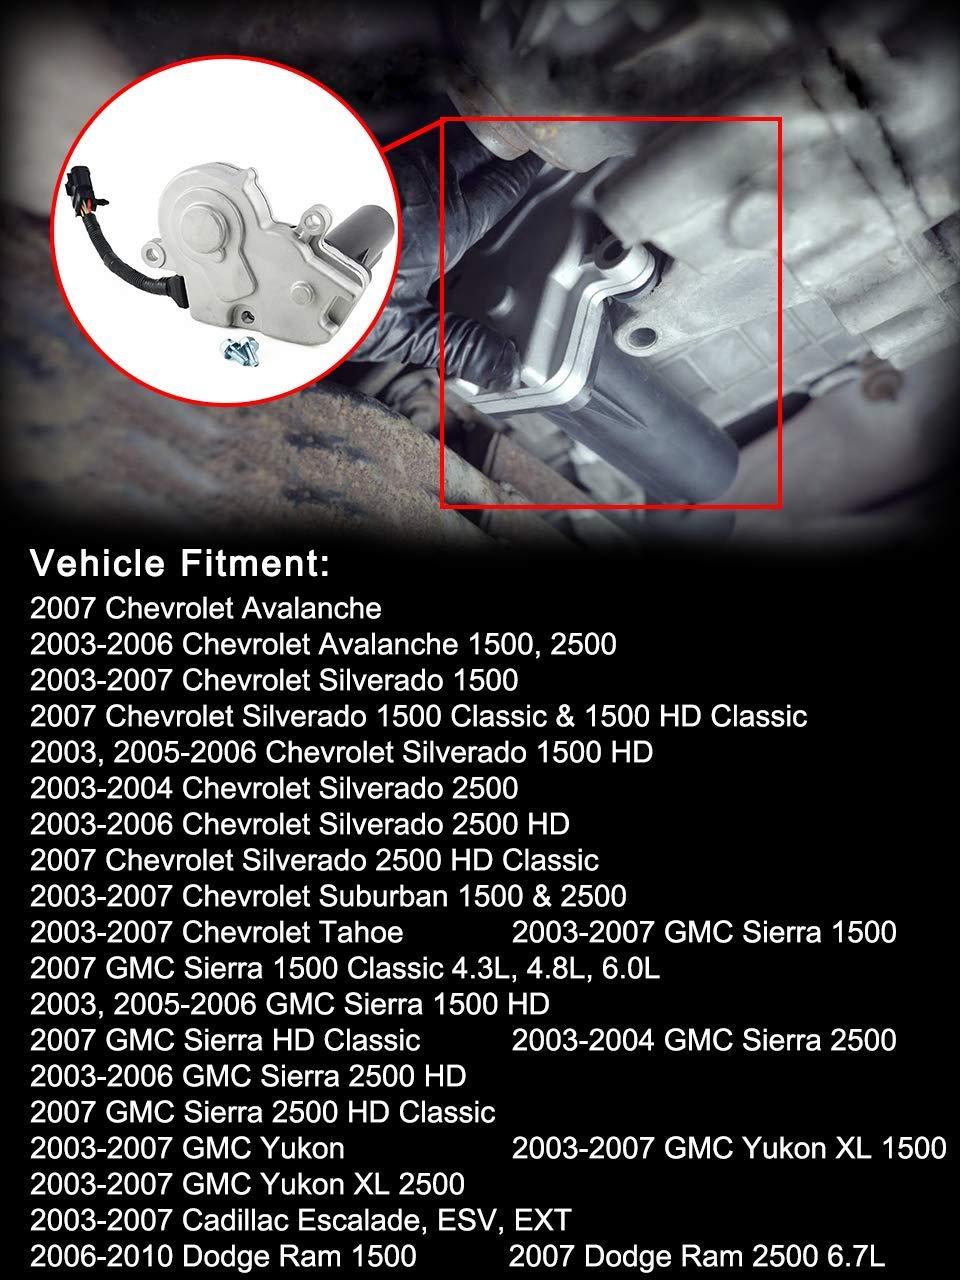 4WD Transfer Case Encoder Motor For Chevy Silverado Tahoe Avalanche Suburban Dodge Ram 1500 2500 GMC Sierra Yukon XL 2003-2010 OEM# 600-910 Shift Actuator